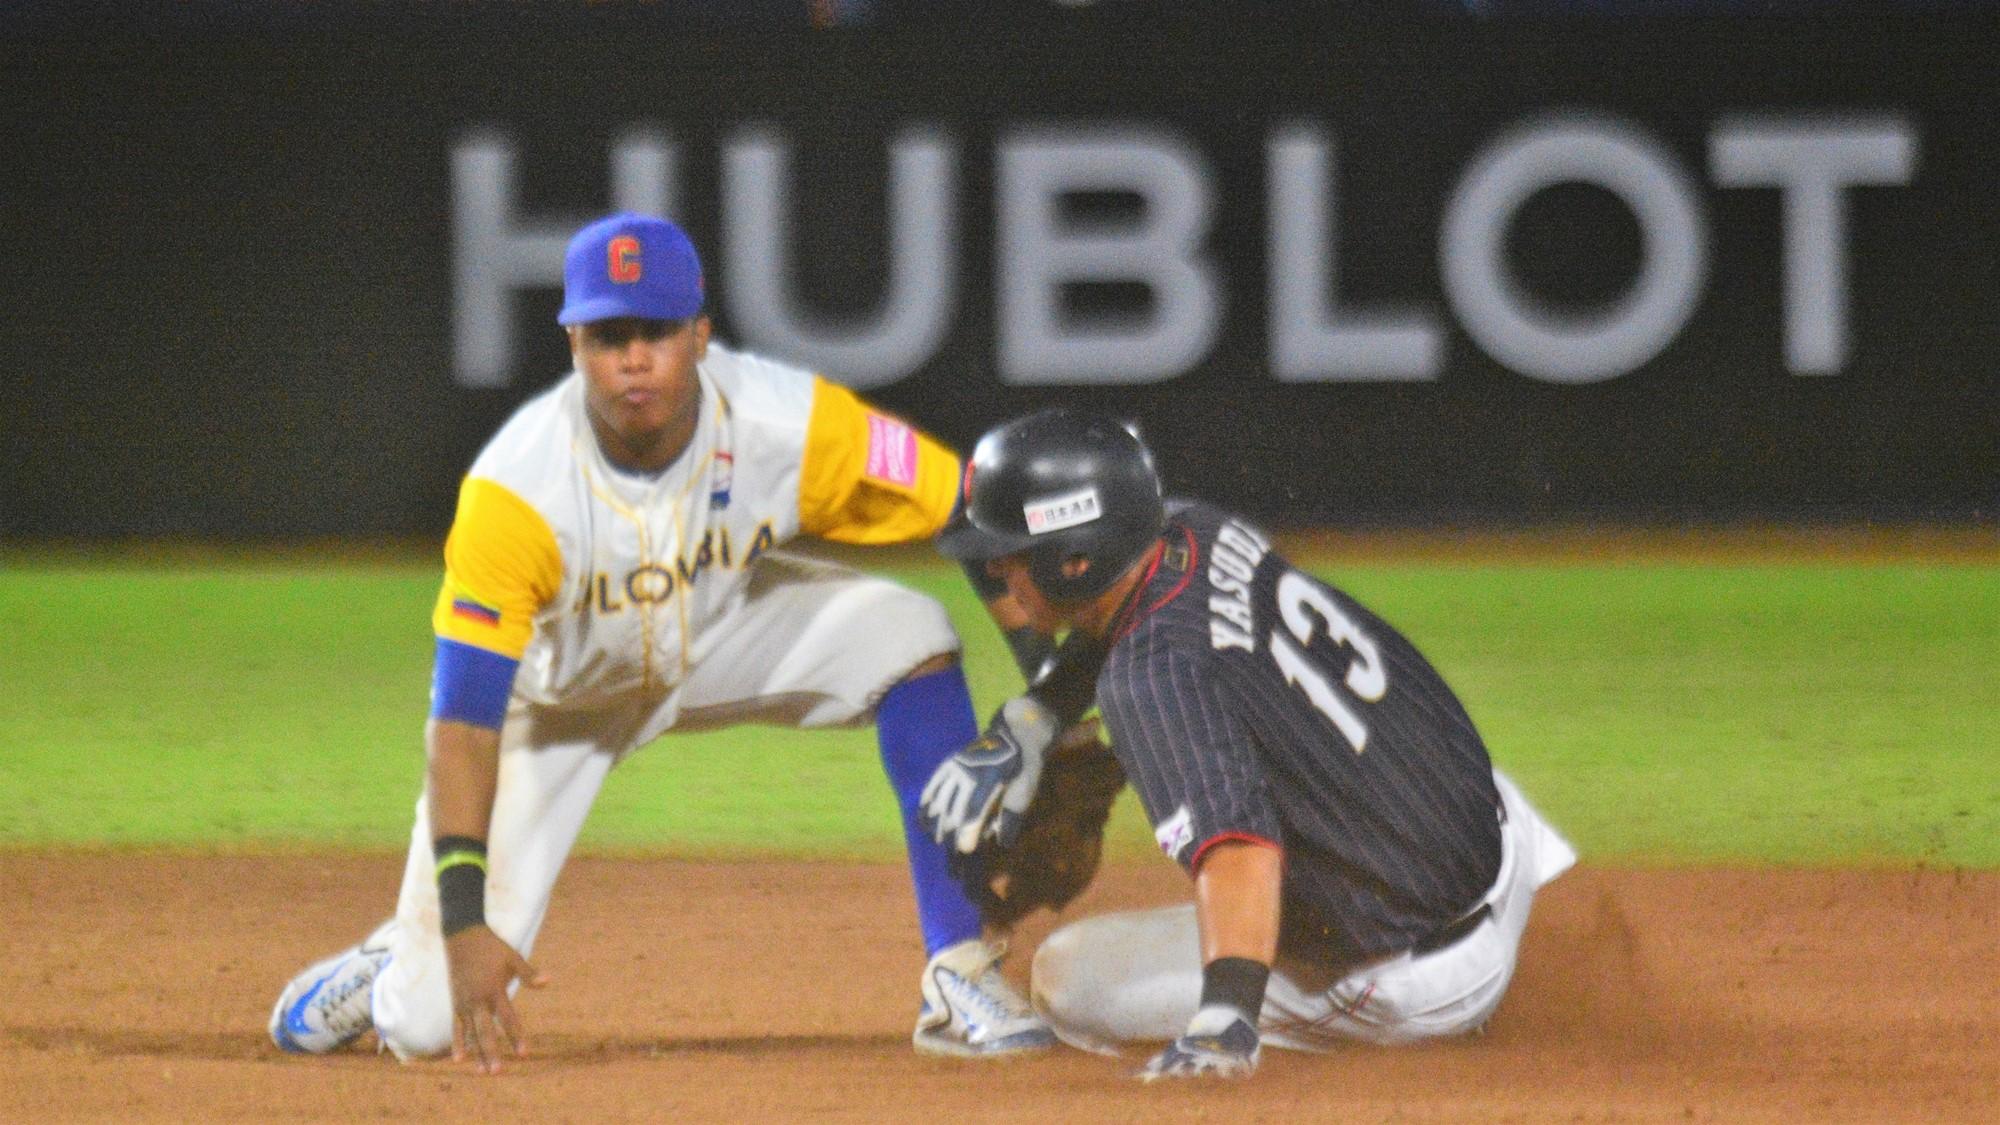 Milton Ramos defends second on a slide by Isanori Yasuda